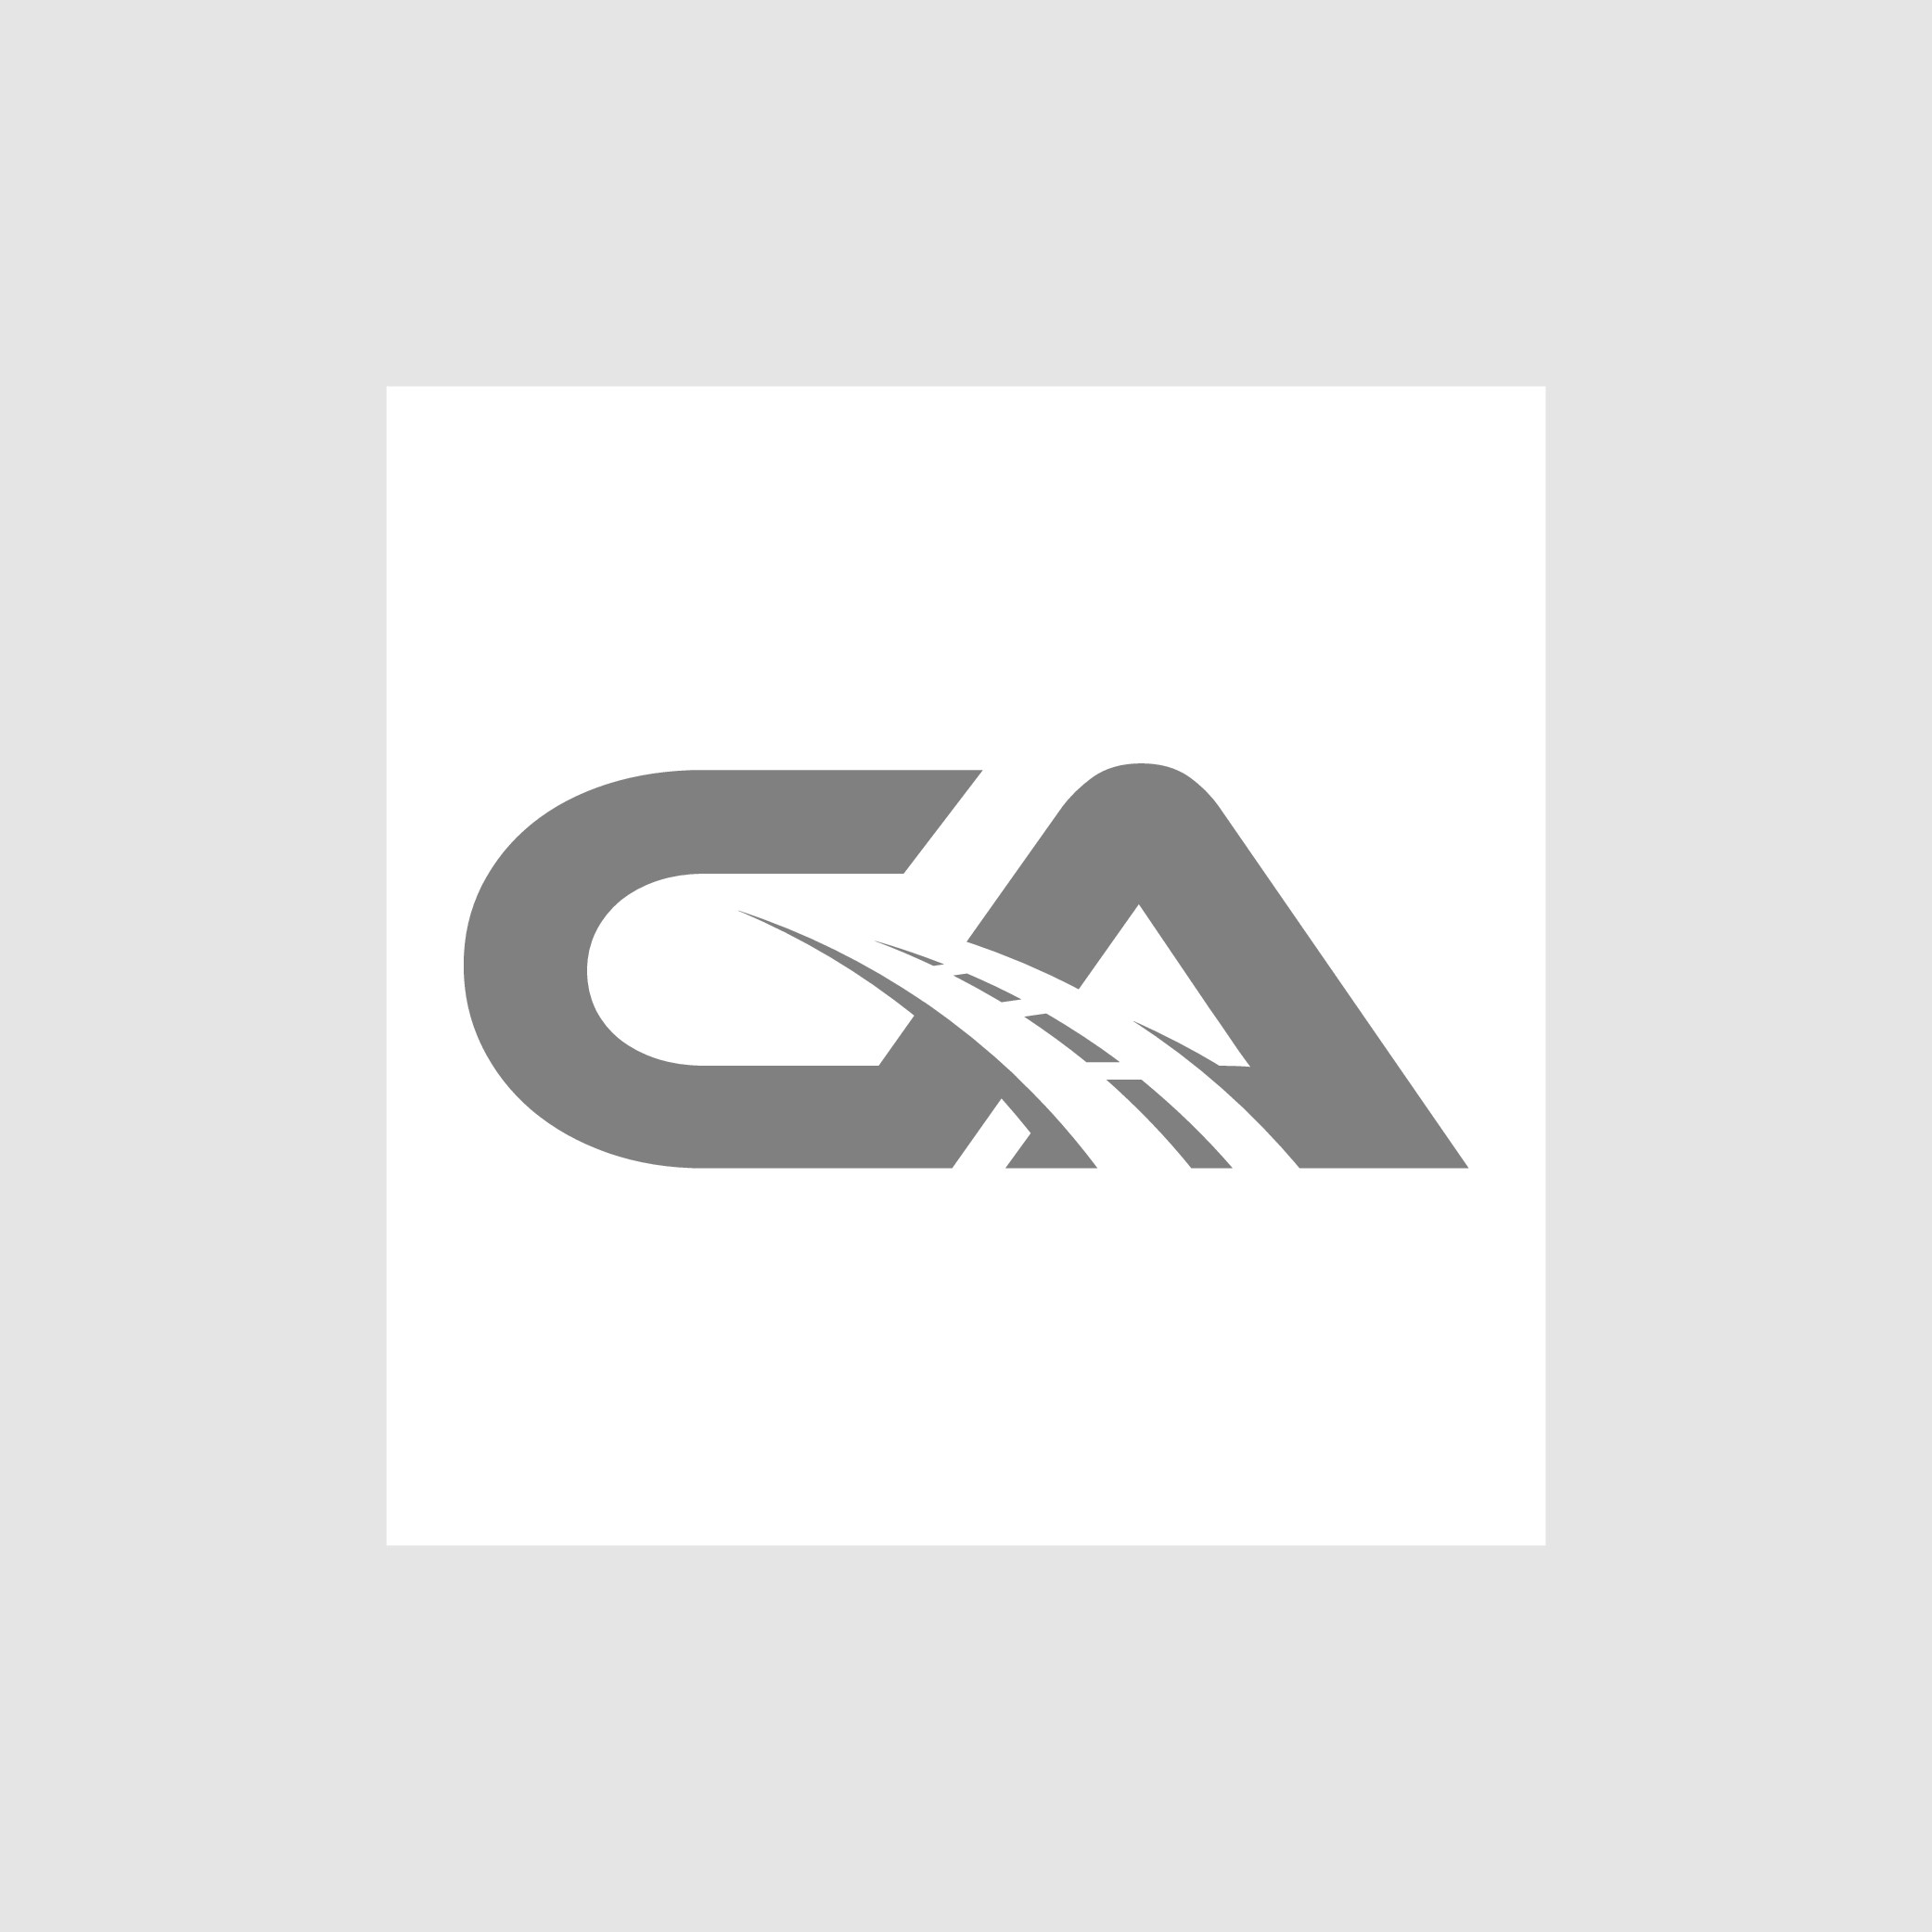 CommonAssist Logo Design